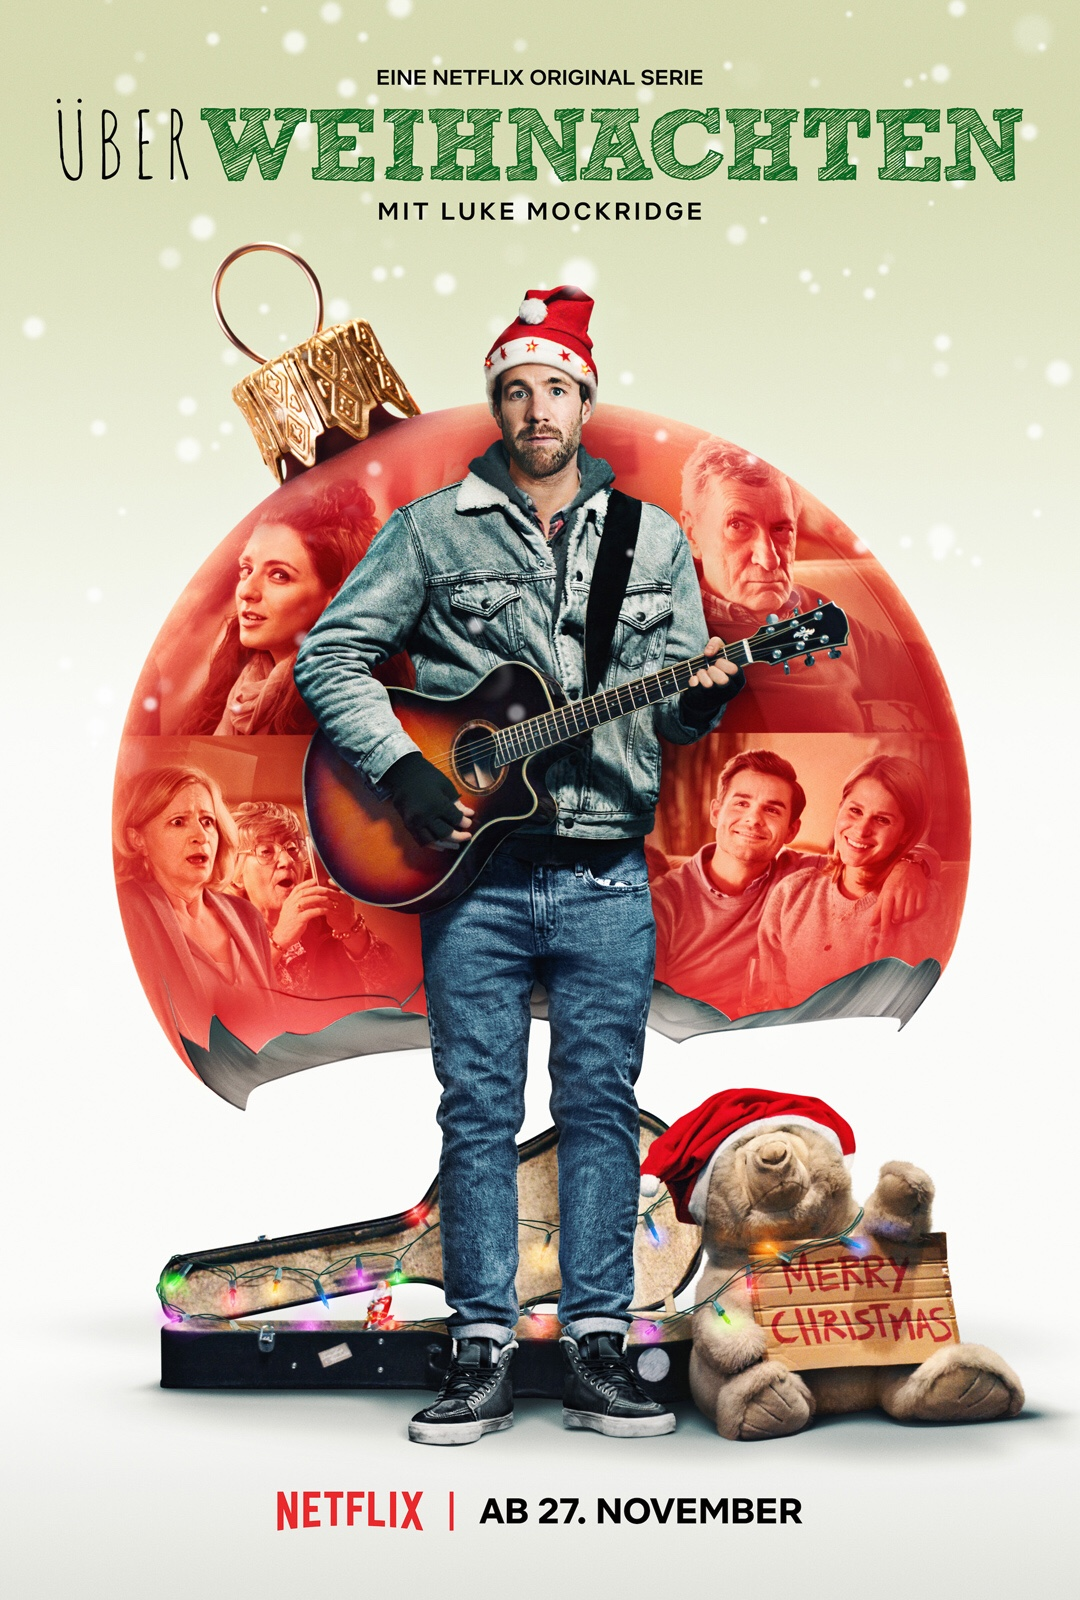 christmas films : le noel de trop